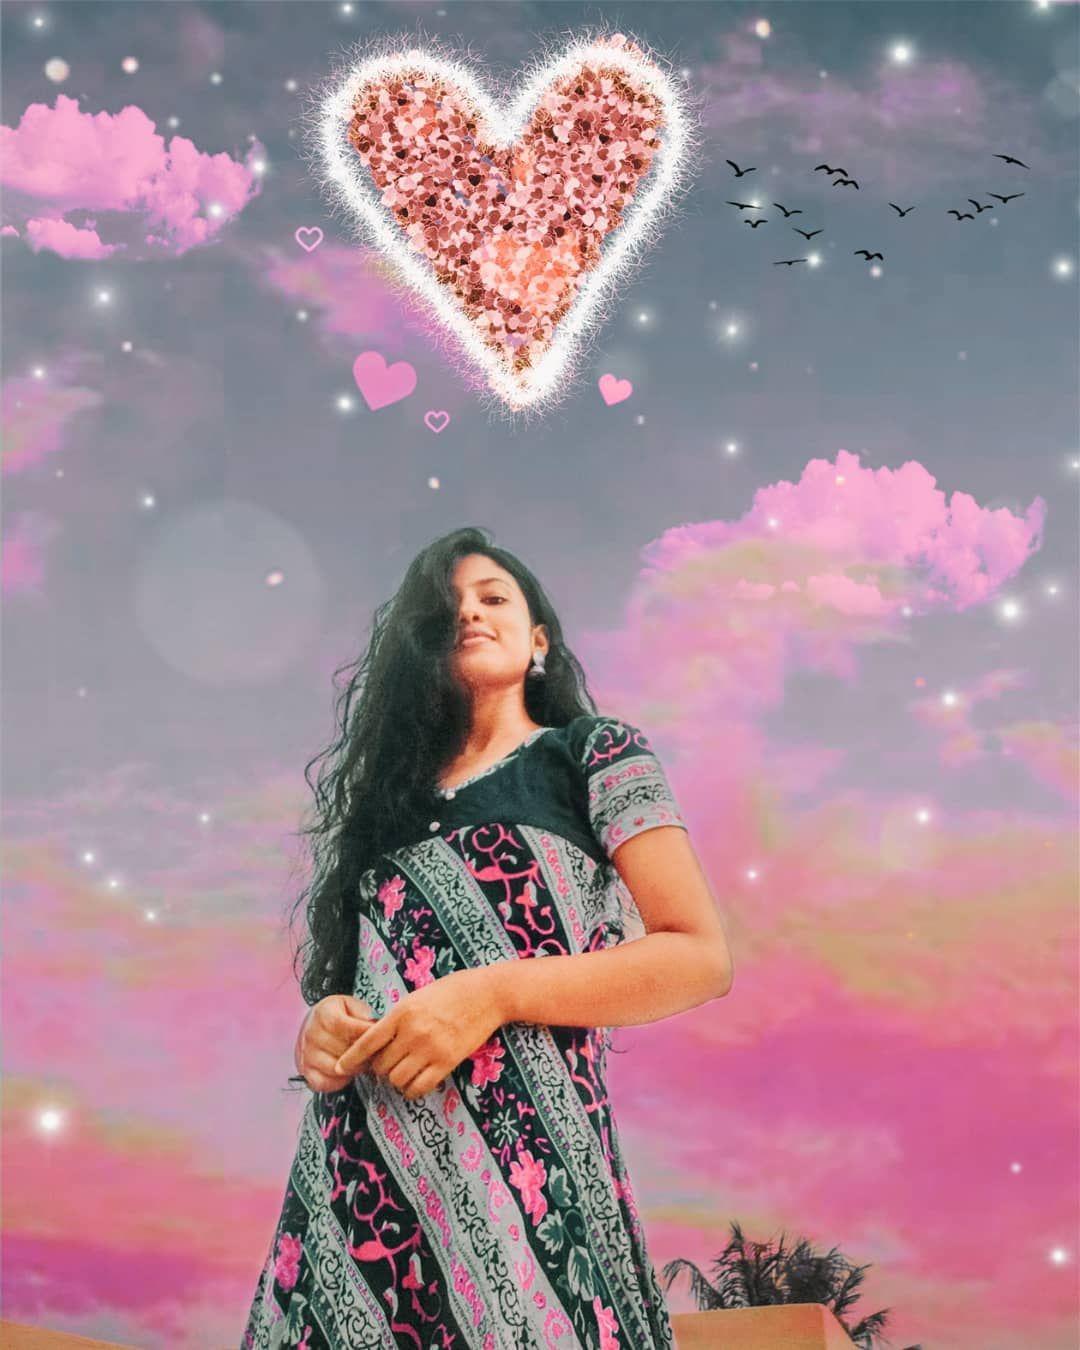 ♡︎p̆̈ĭ̈n̆̈k̆̈♡︎ . . Edit - picsart (@picsart ) 📸- redmi note 5 pro (@redmiindia ) . . . . Follow me for more🌻(@floria_solasta ) #creativephotography #imaginationart #picsart #dreamsetup #skylovers #pinksky #selfportraitphotography #explorepage #pinkclouds #cottoncandyhair #photomanipulation #surrealism #picstagram #creative #aesthetic #portsinspired #pinterest #creativeedits #picsartedit #instagramer #explore #picsartstudio #createwithfloria